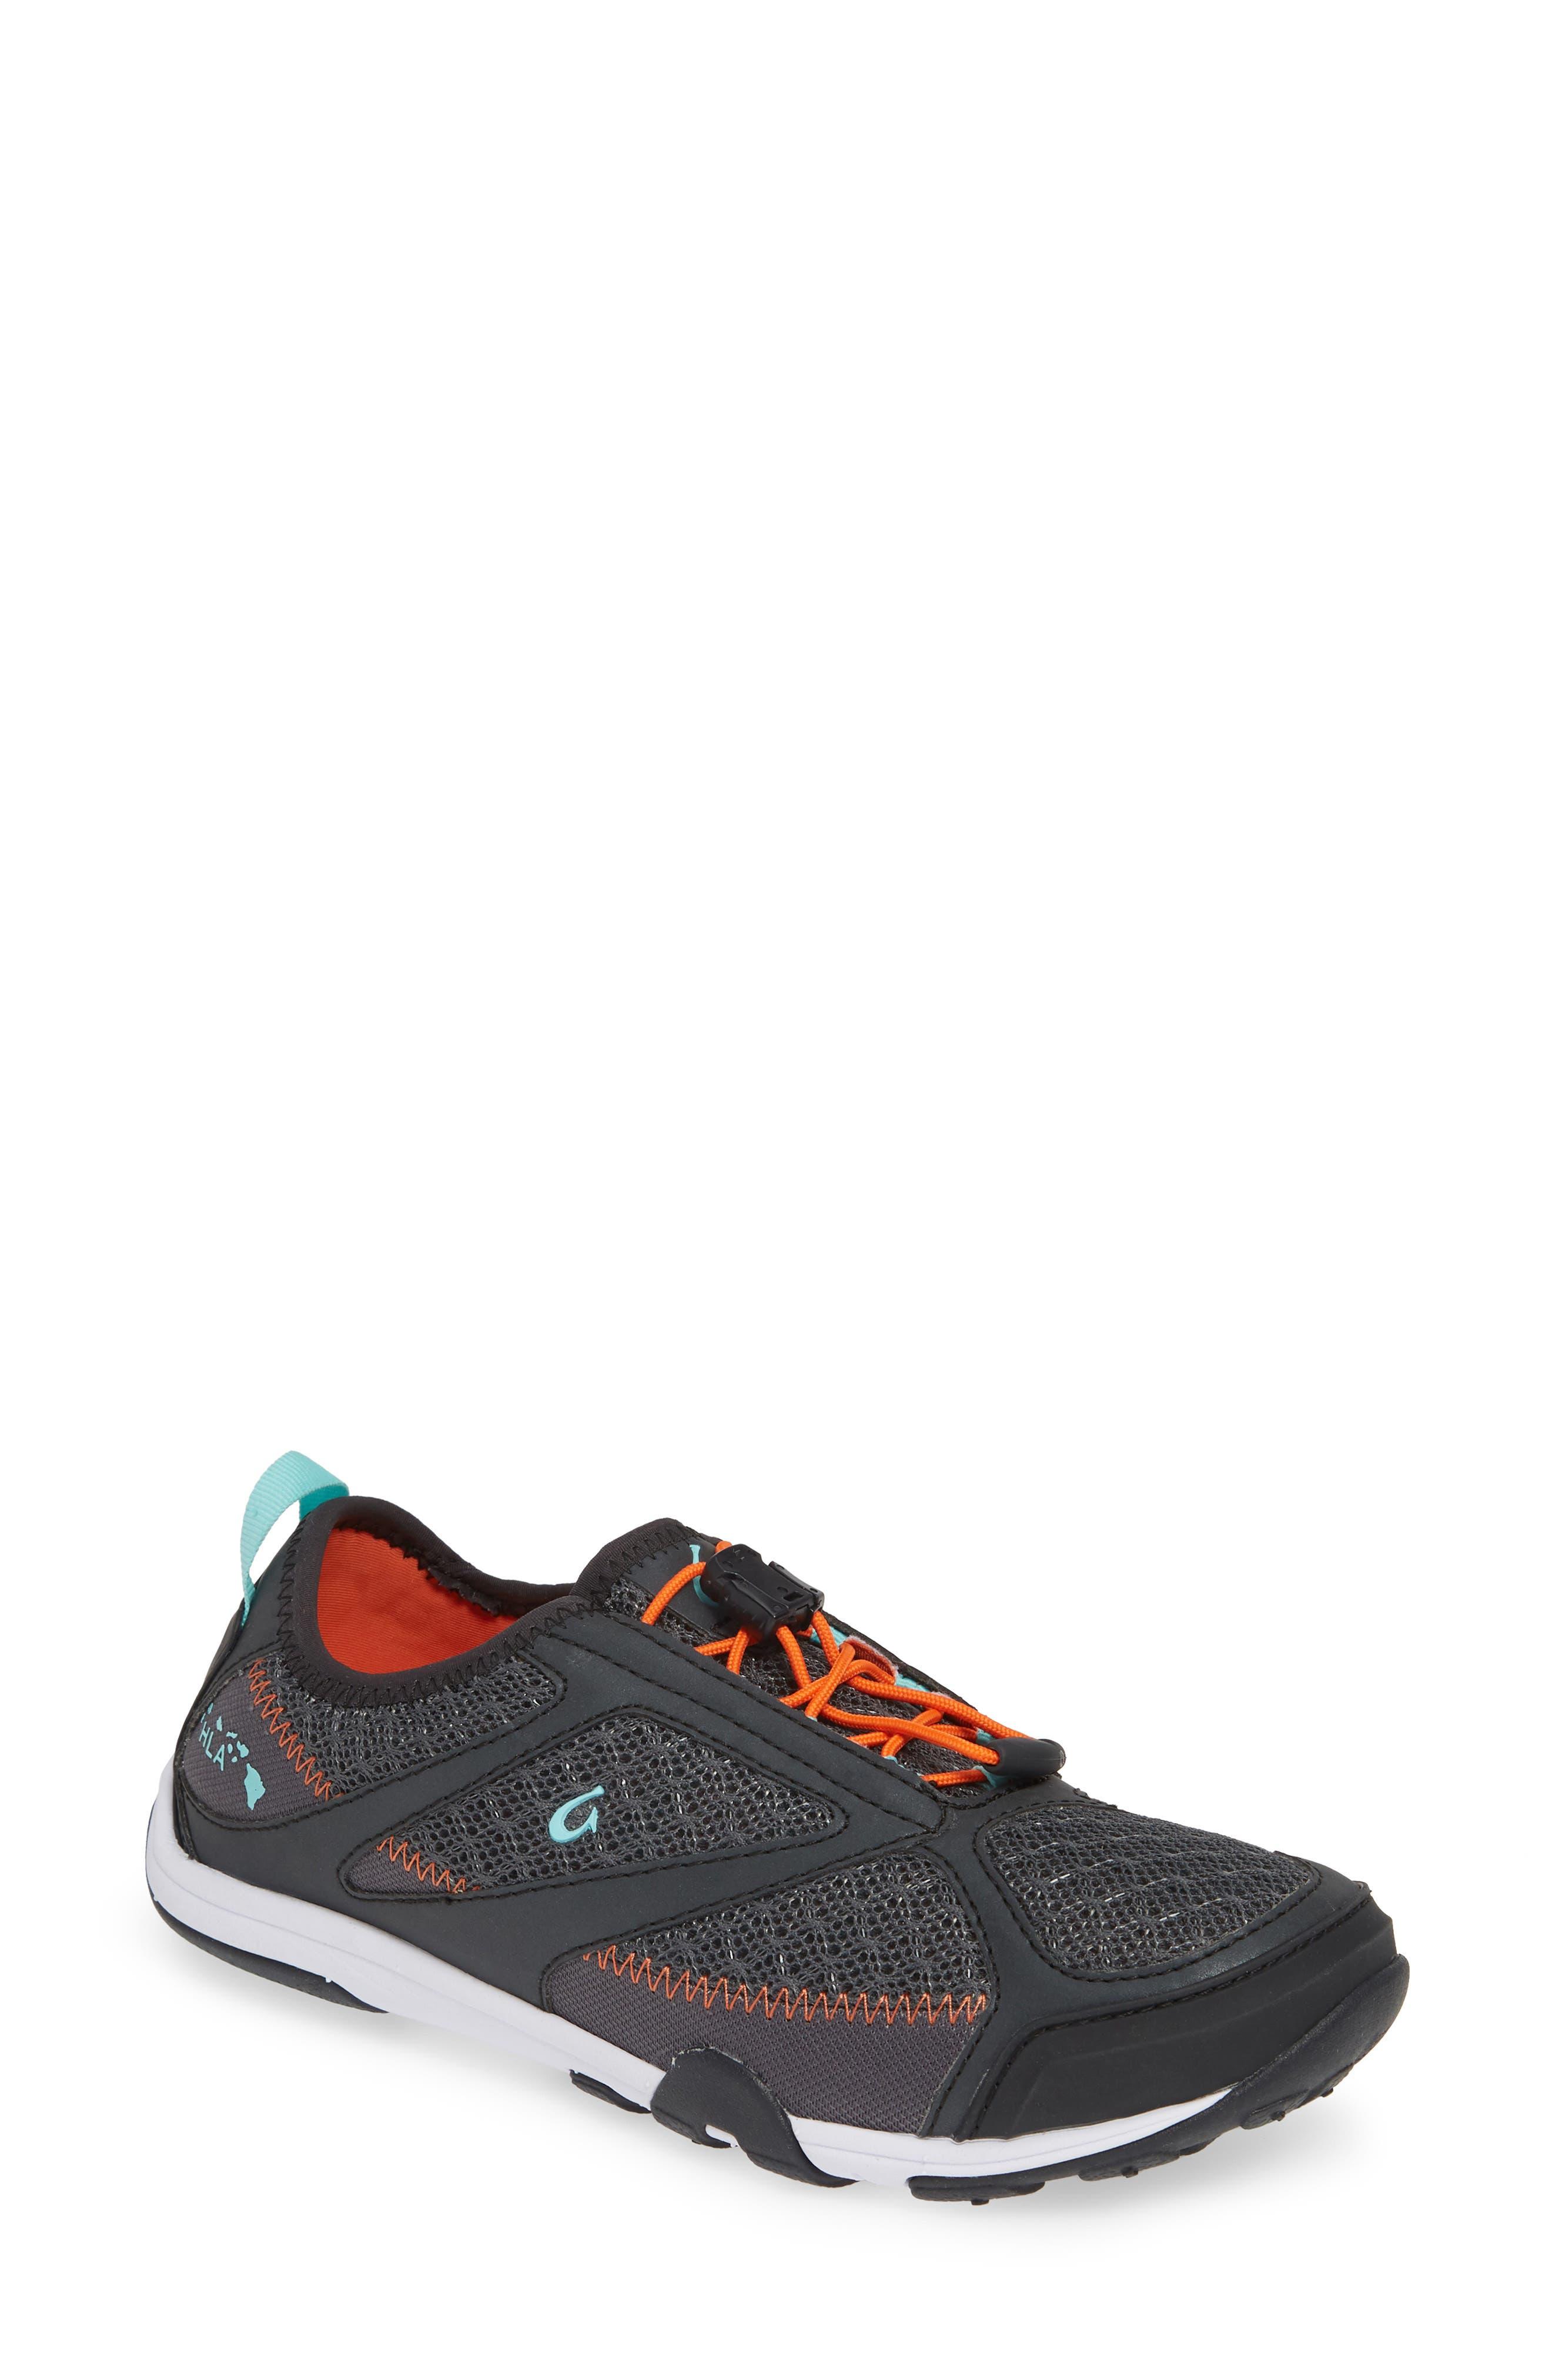 'Eleu' Water-Resistant Sneaker,                             Main thumbnail 1, color,                             DARK SHADOW/ LAVA ROCK FABRIC